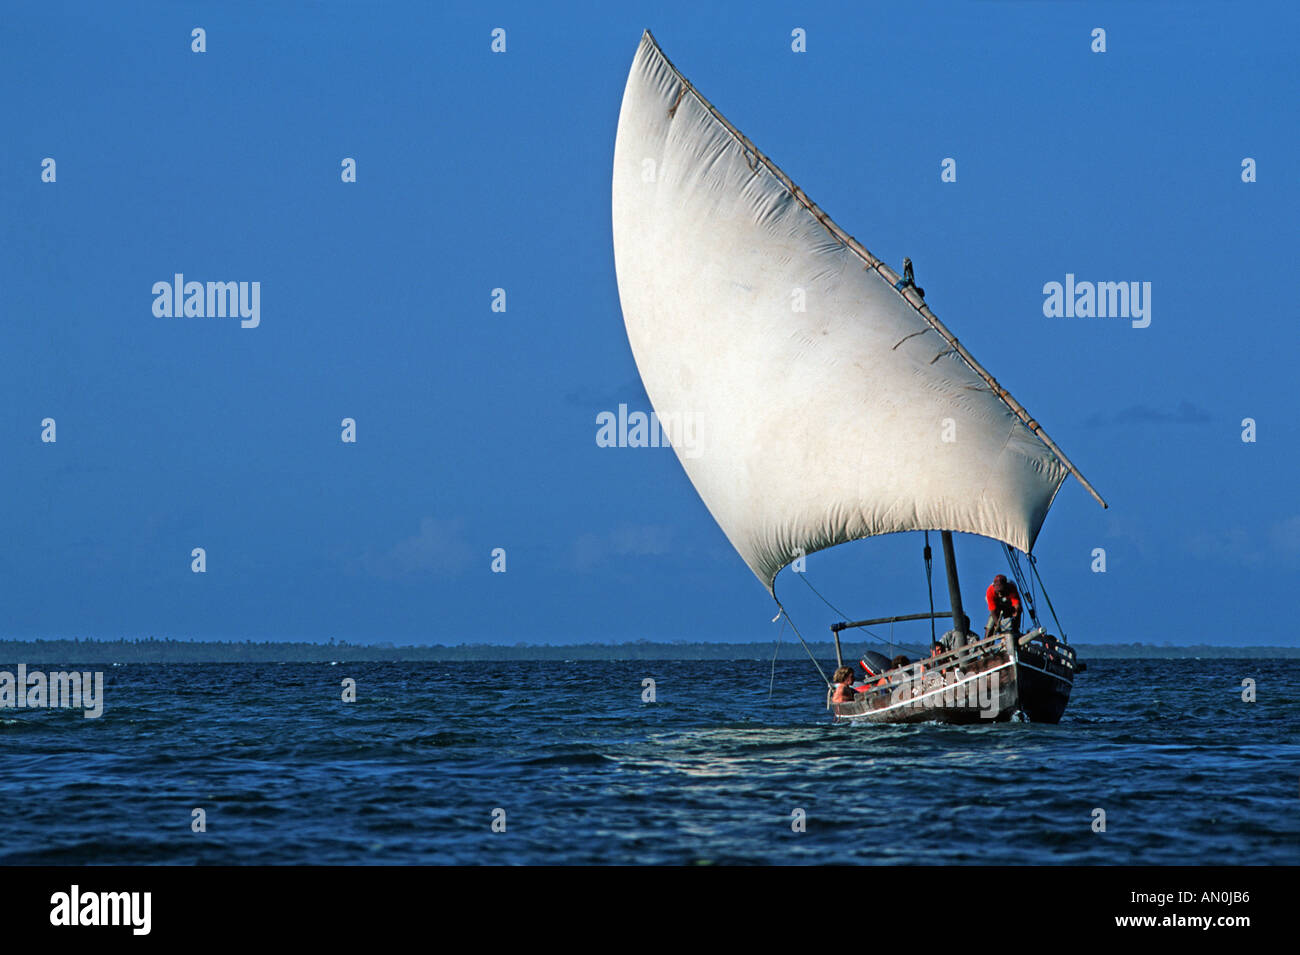 Sailing dhow excursion boat for visitors to the Chole Lodge on Chole island adjacent to Mafia island Tanzania East Africa - Stock Image